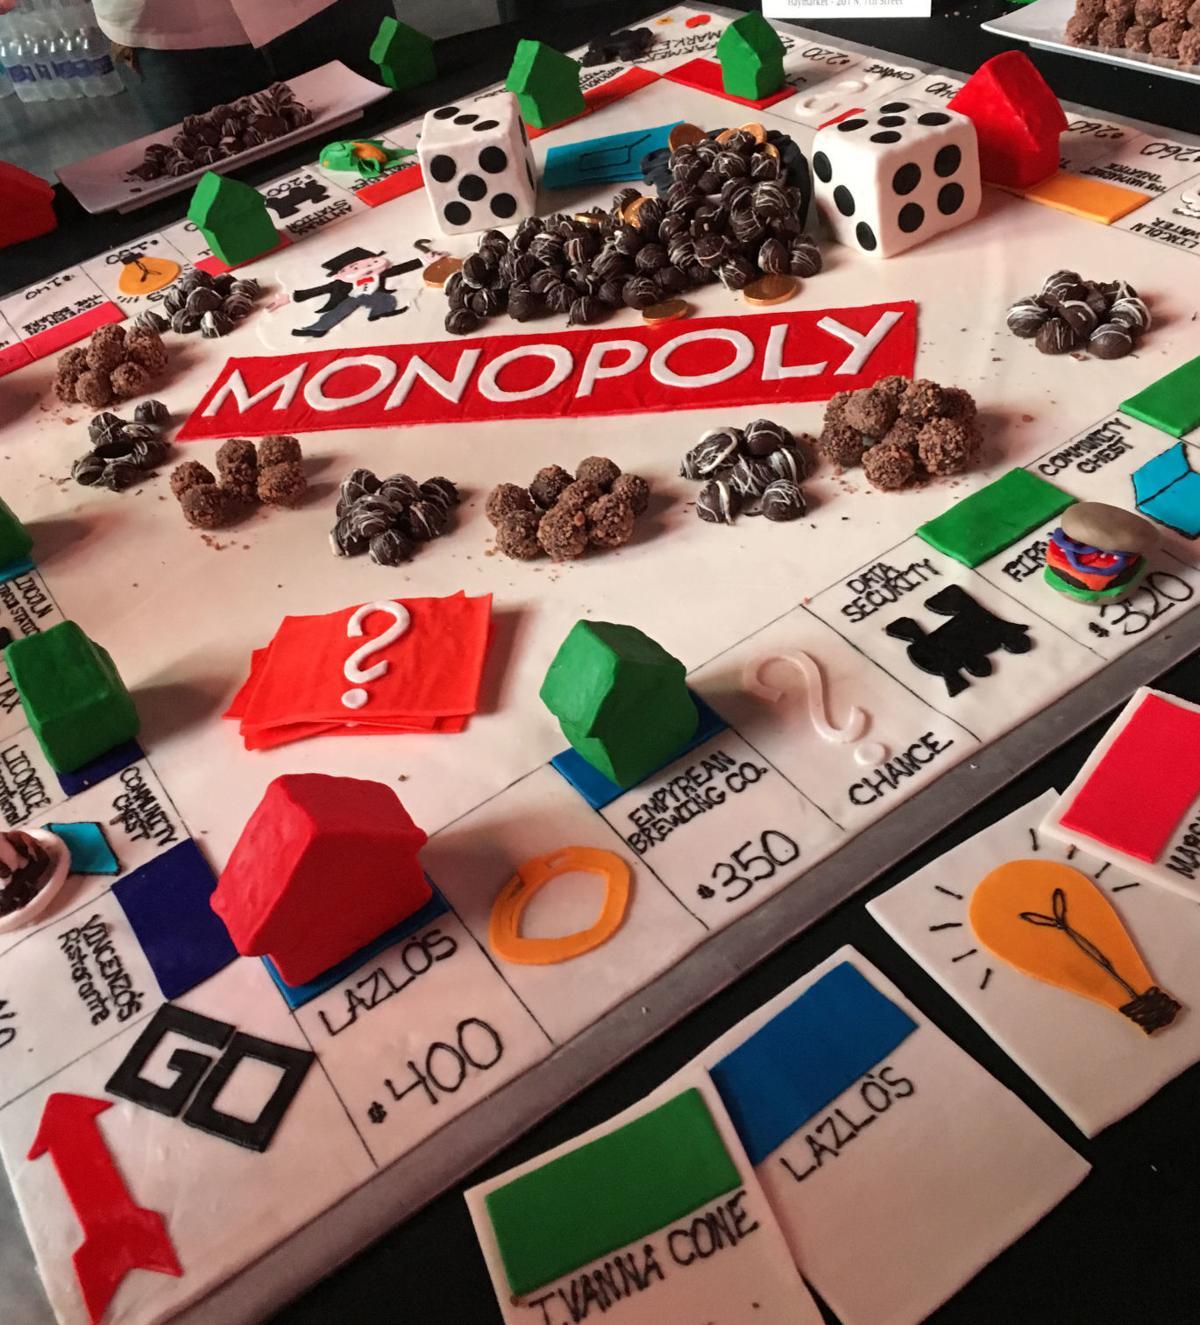 Lazlo's Monopoly board